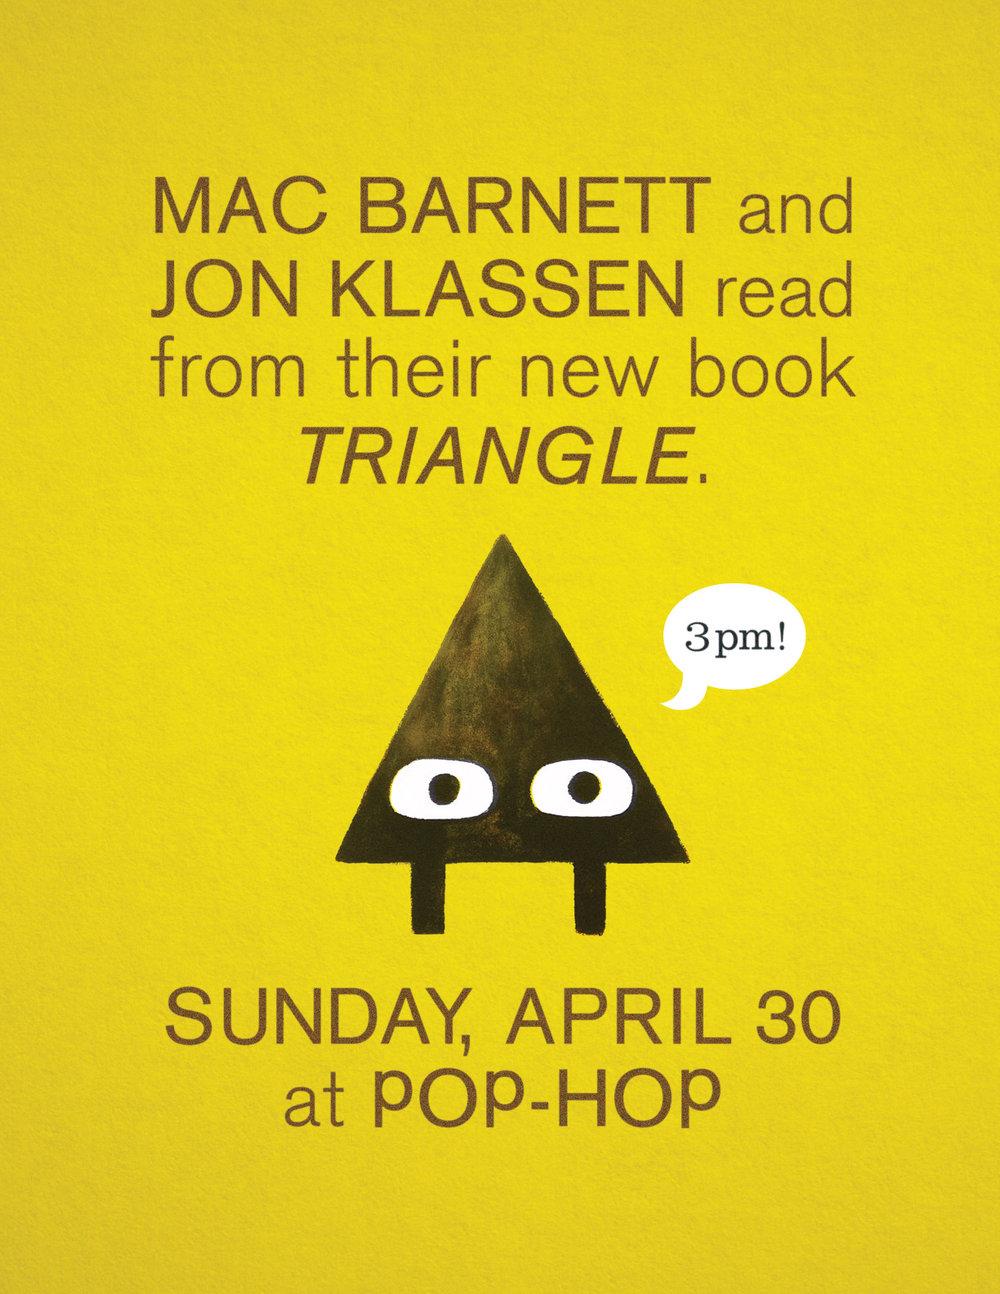 TRIANGLE ~ MAC BARNETT & JON KLASSEN - 04/30/17 @ 3pm